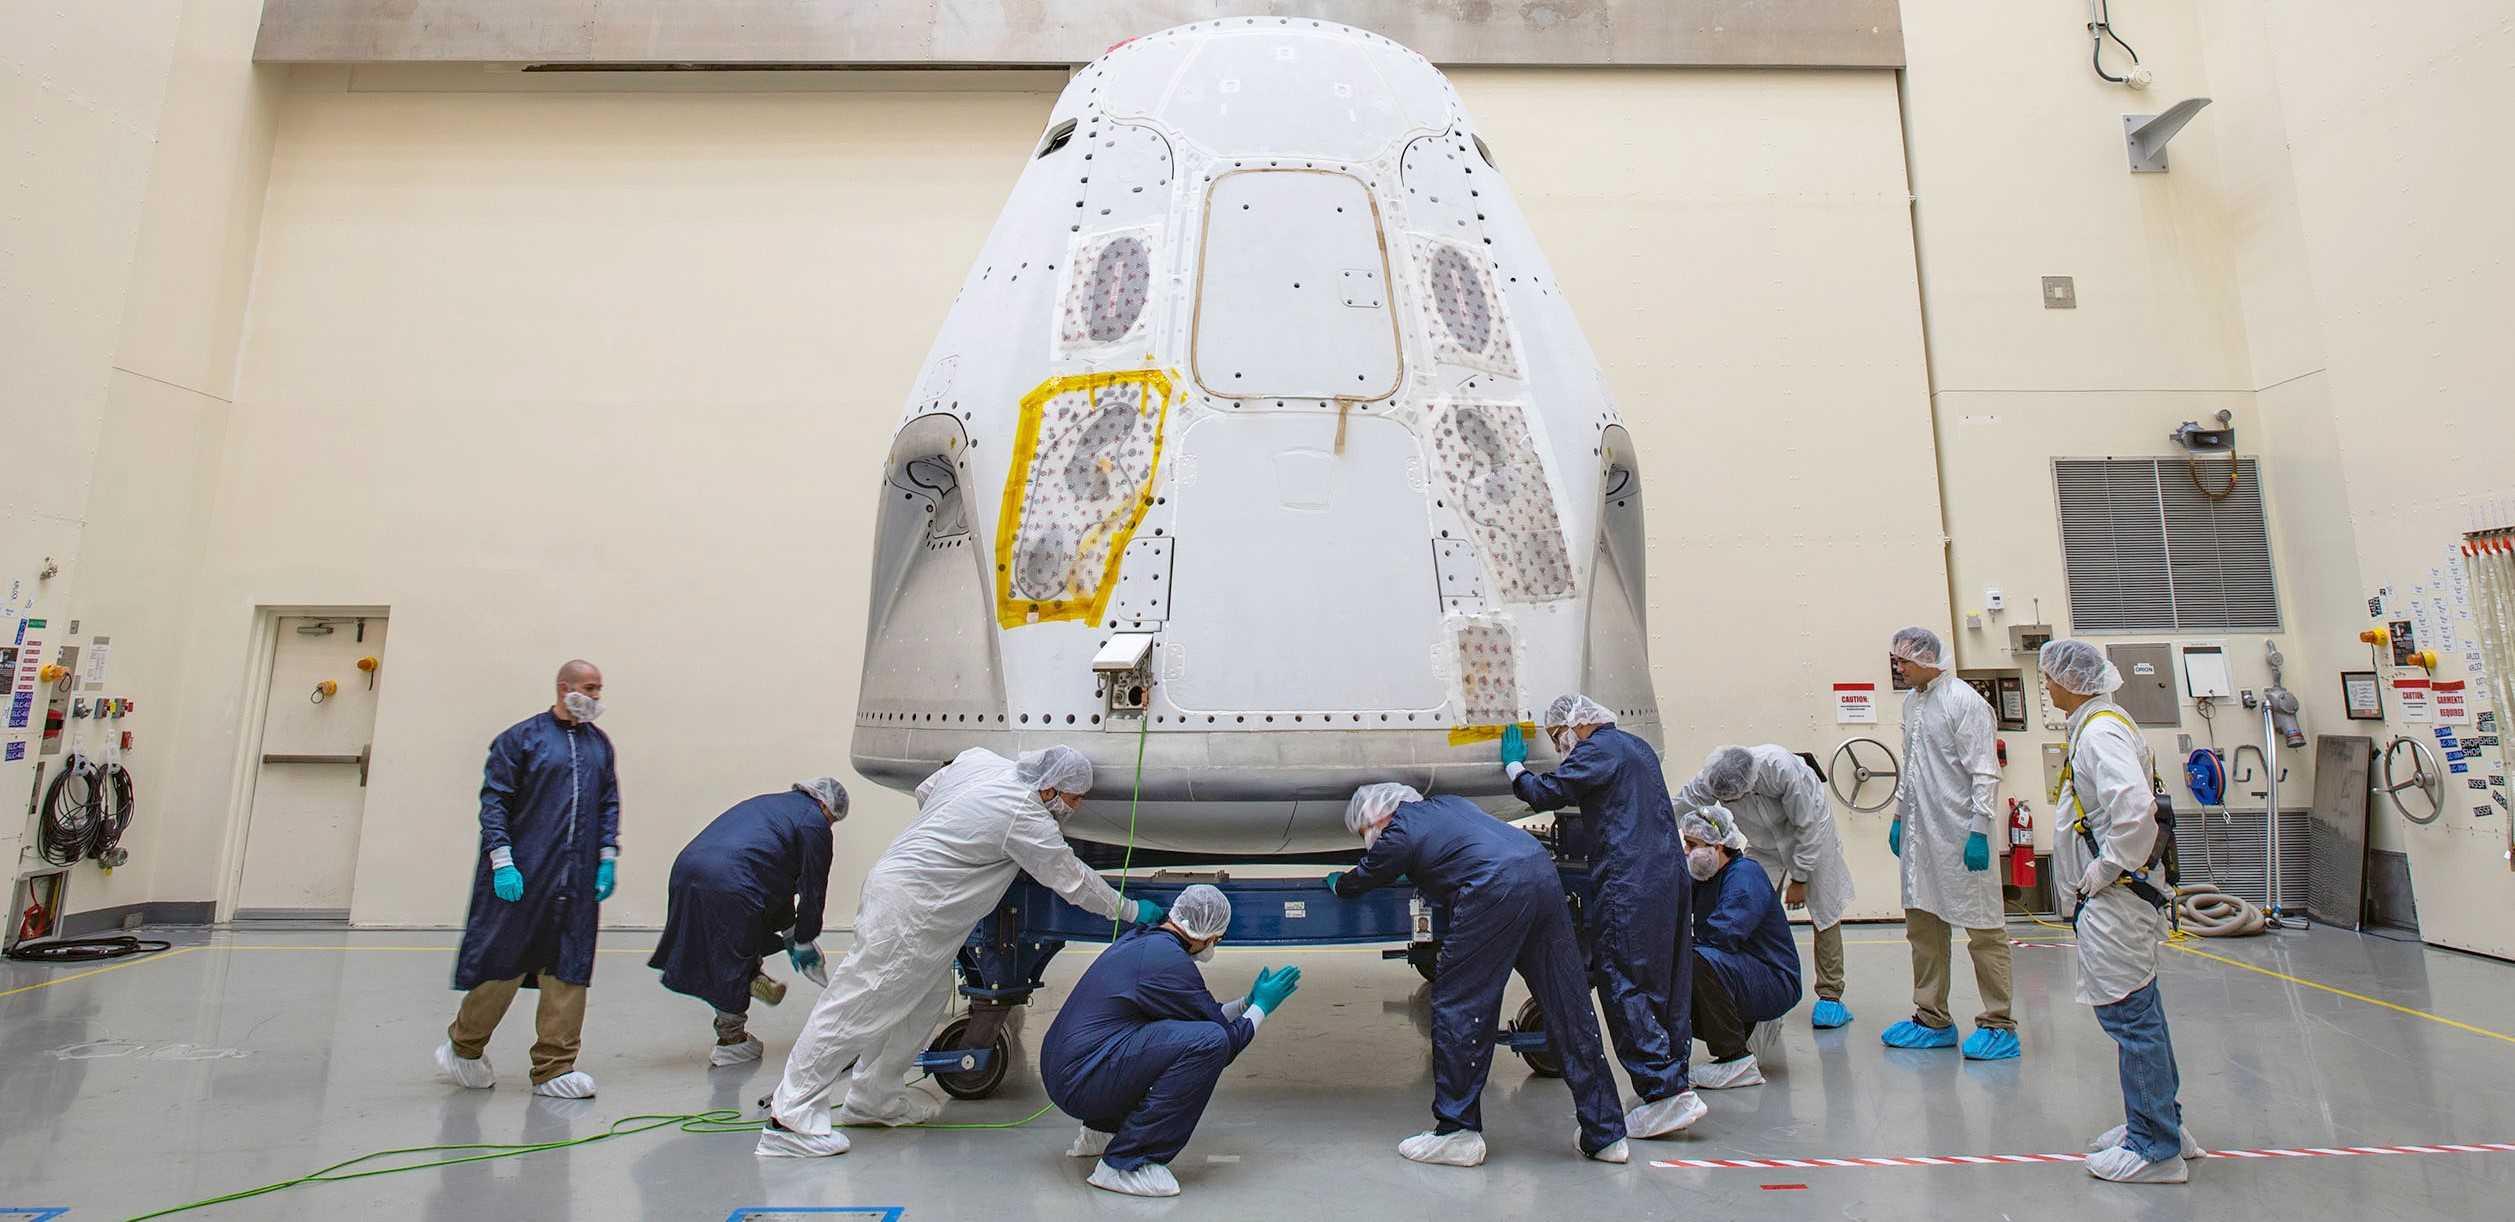 Demo-2 Crew Dragon C206 FL arrival 021320 (SpaceX) 1 crop (c)